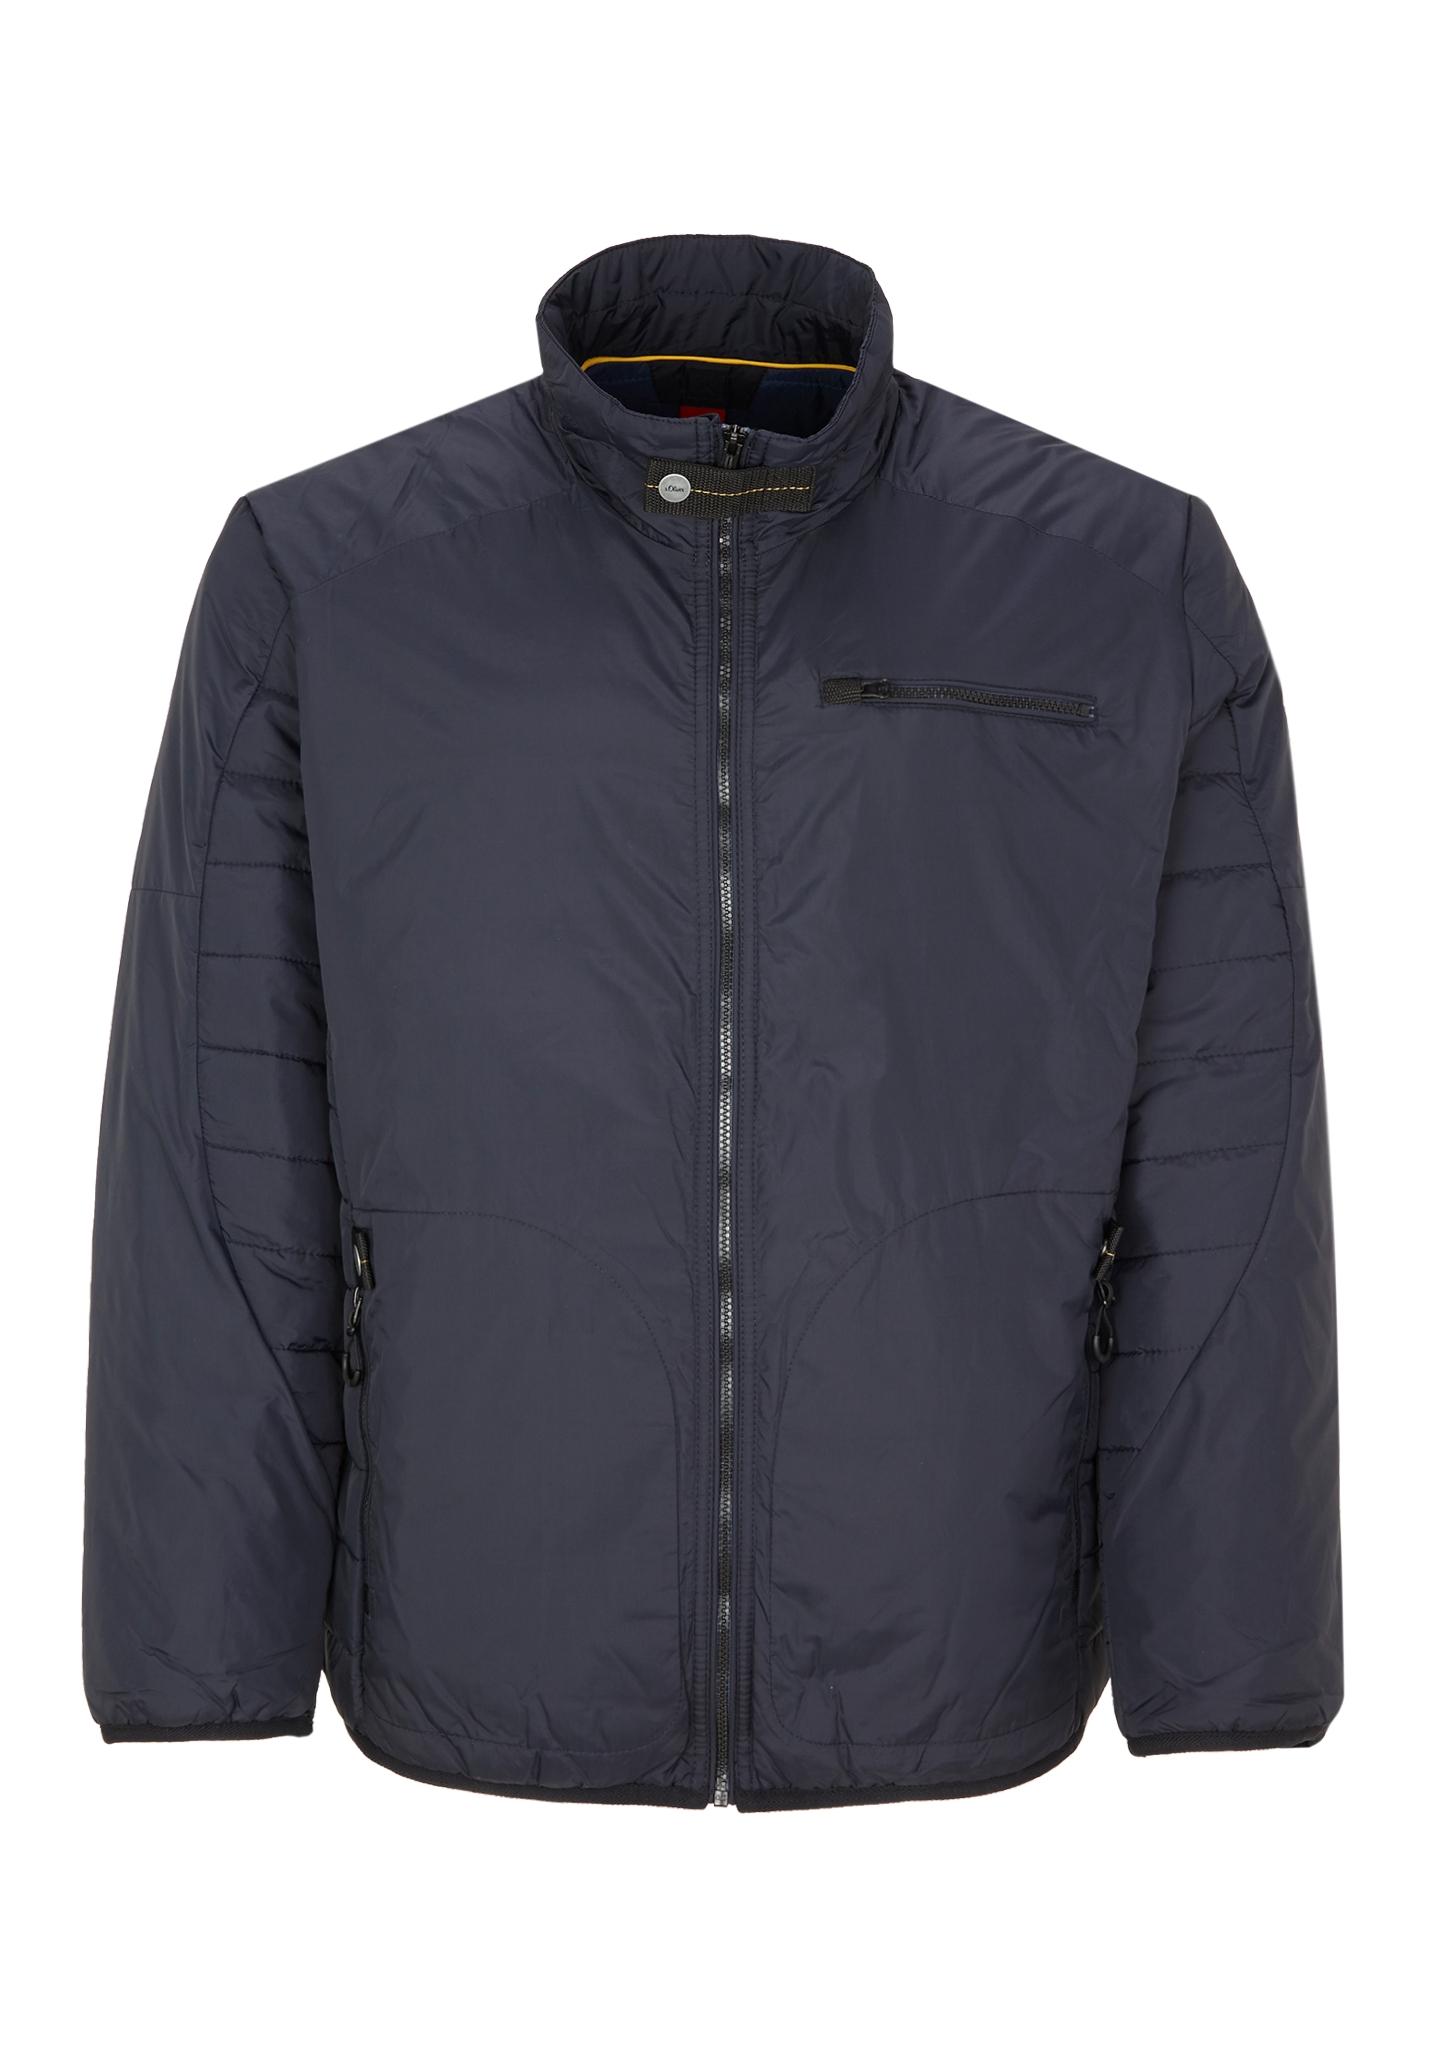 Outdoor-Jacke   Sportbekleidung   Blau   Obermaterial 100% polyamid  futter 100% polyamid  füllmaterial 100% polyester   s.Oliver Men Big Sizes